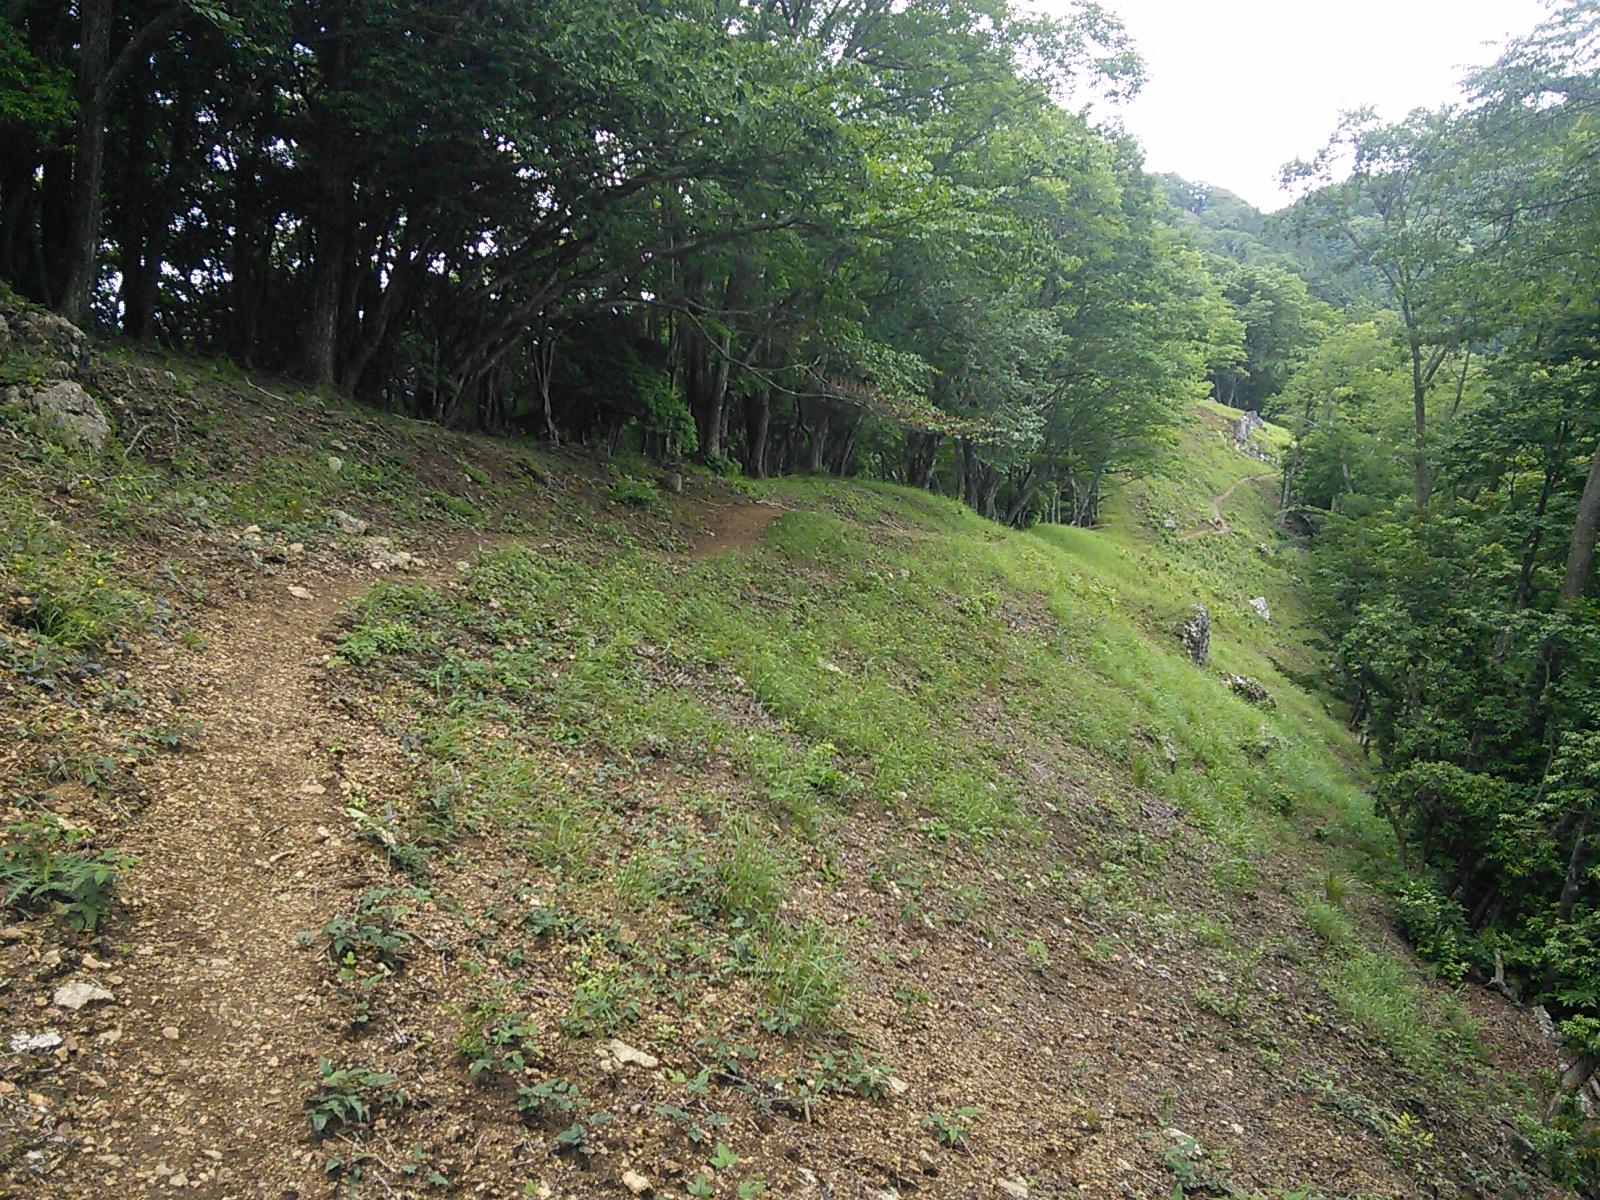 [PR]2015年6月28日 有間山稜・日向沢ノ峰